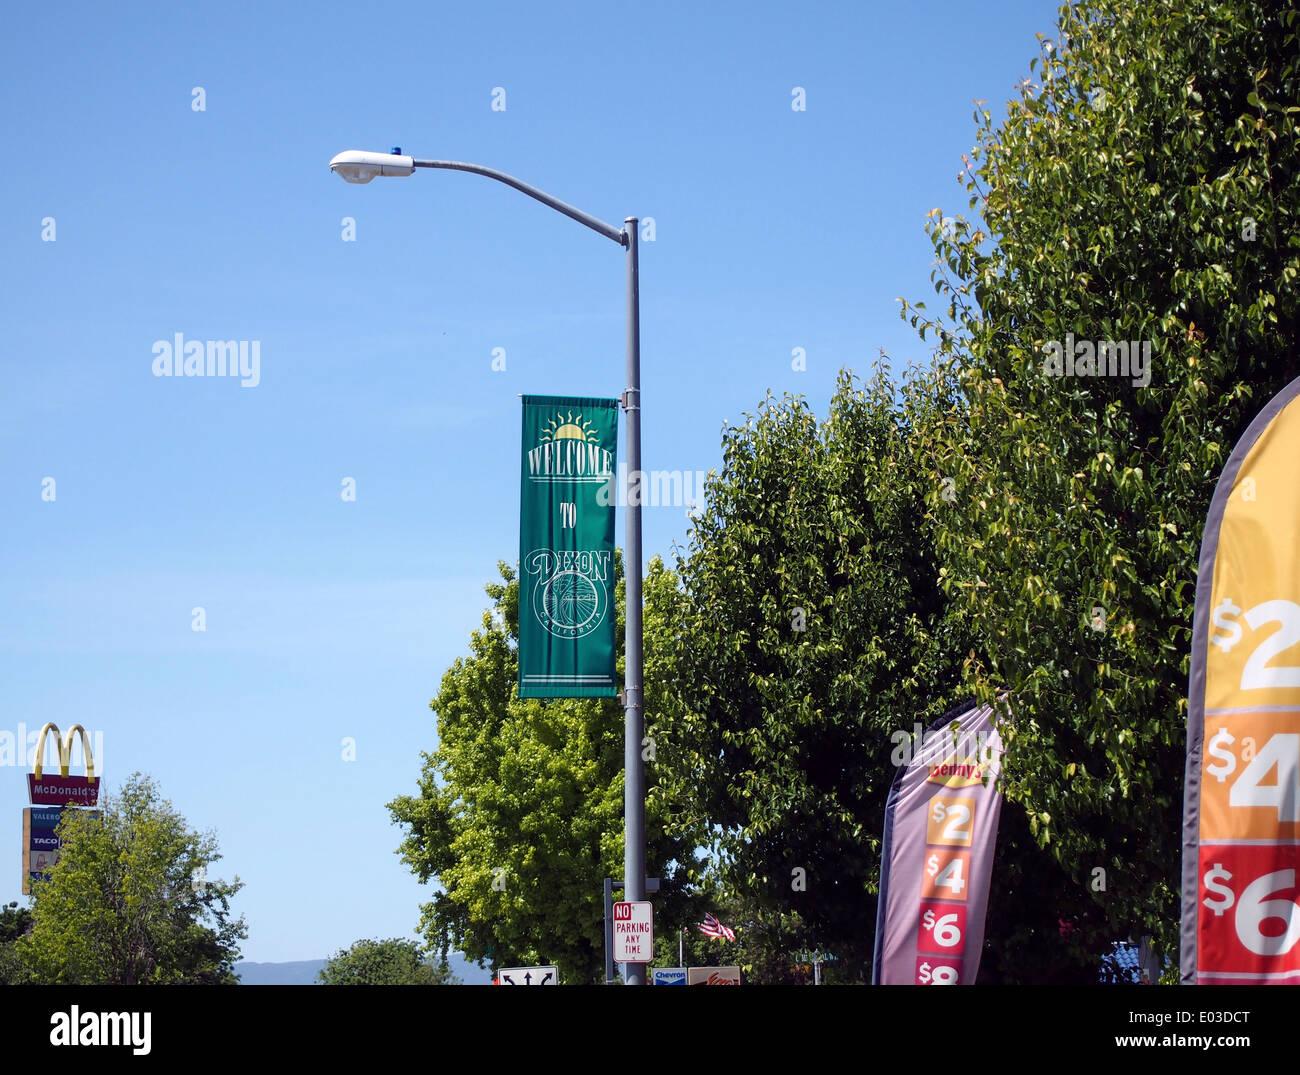 Dixon California banner hangs from street light - Stock Image